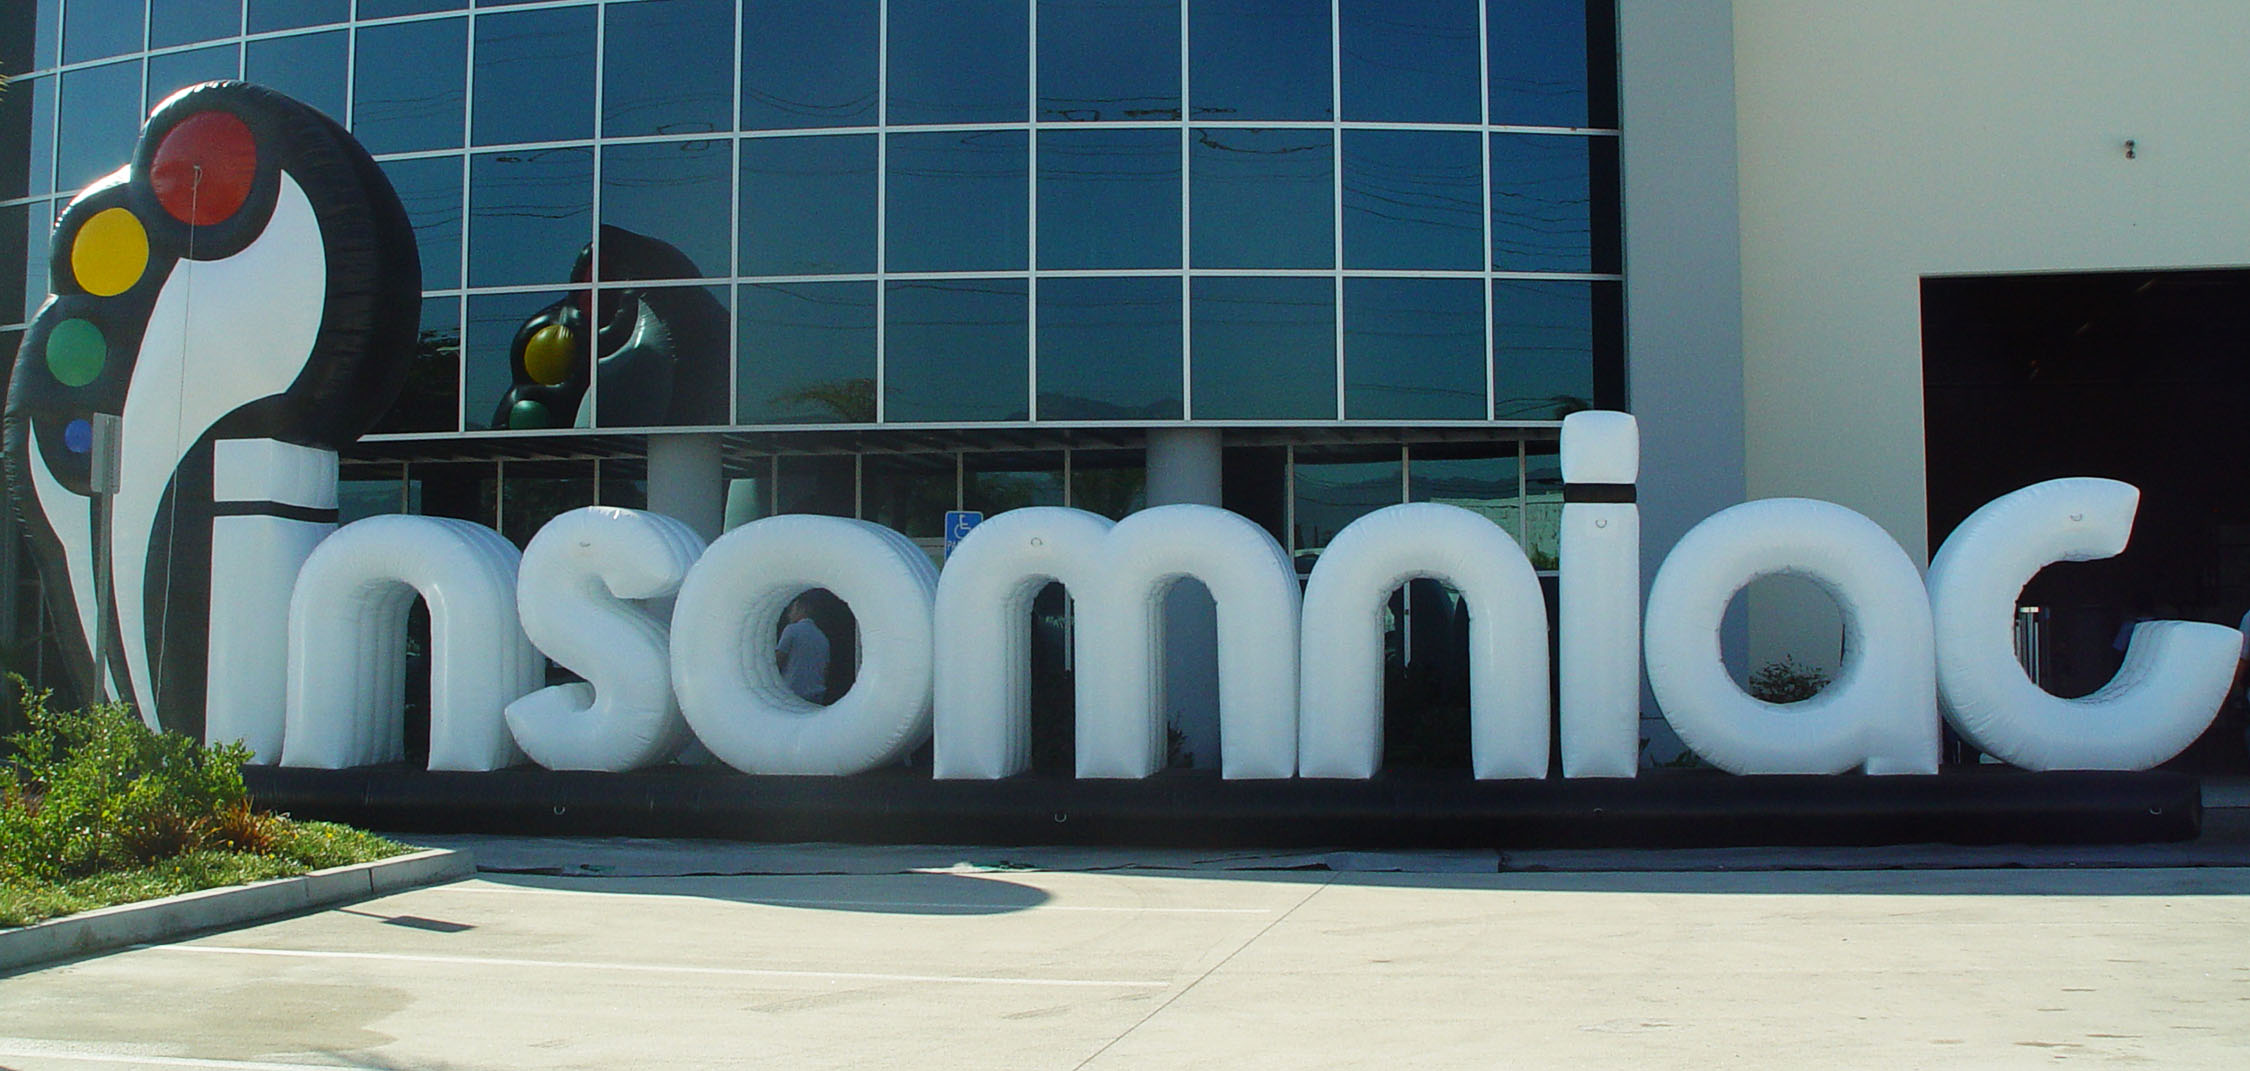 inflatable letters logo custom